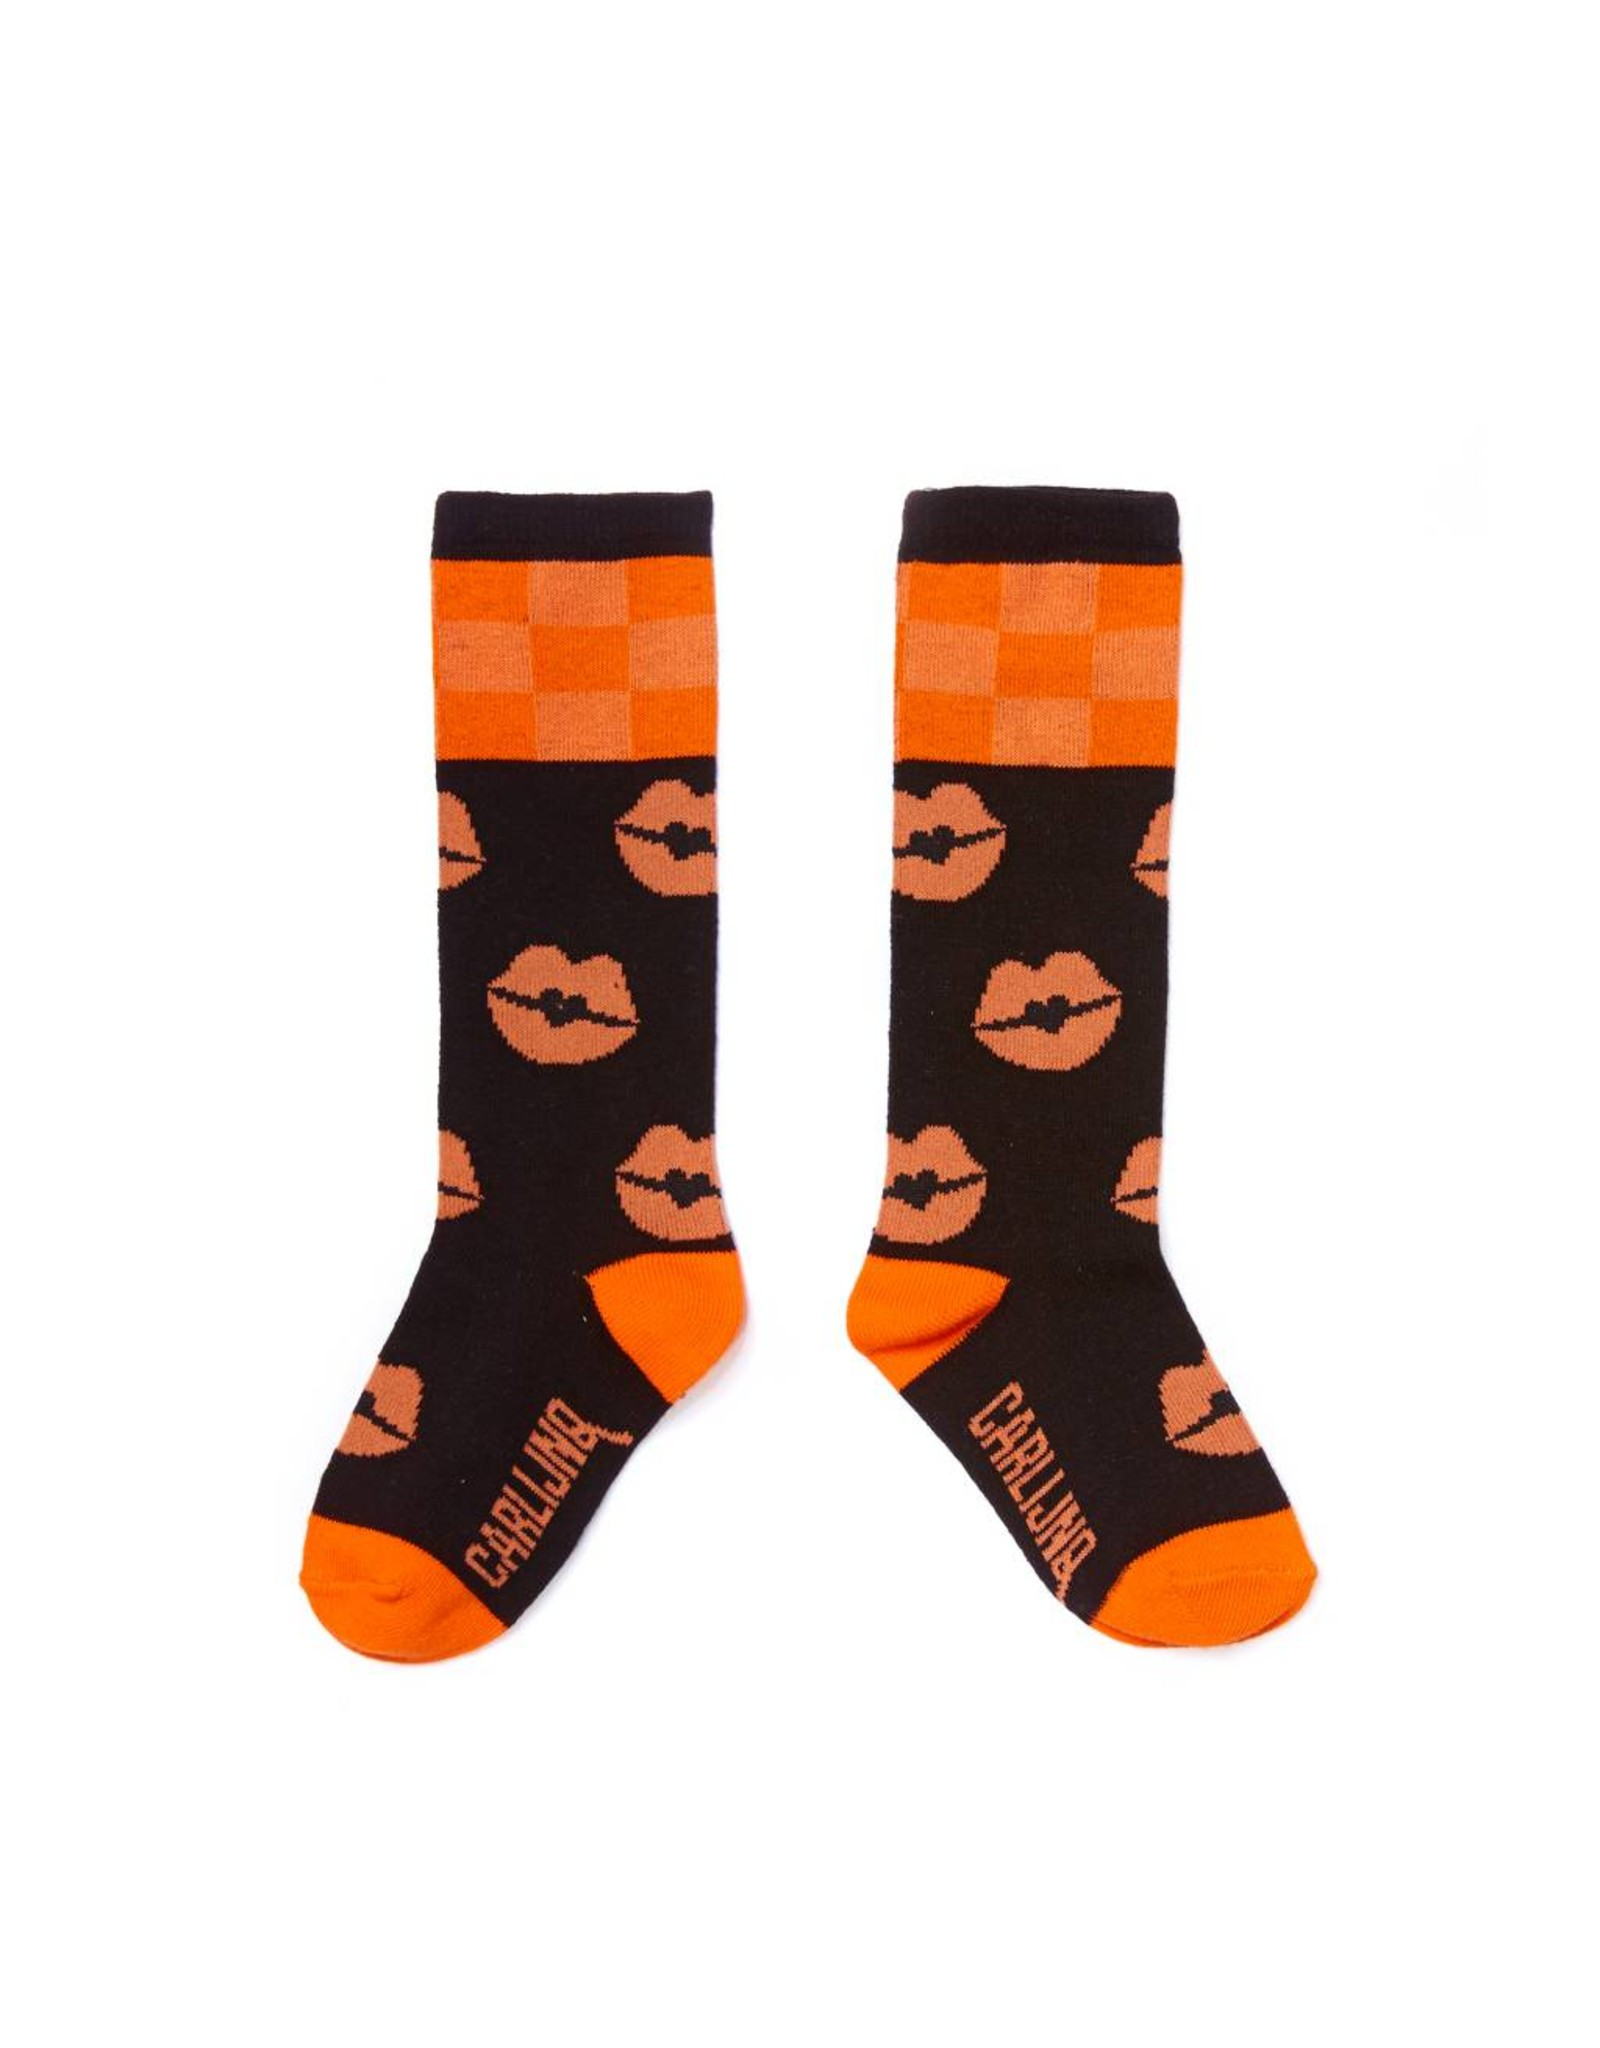 CarlijnQ Knee Socks - kiss goodbye